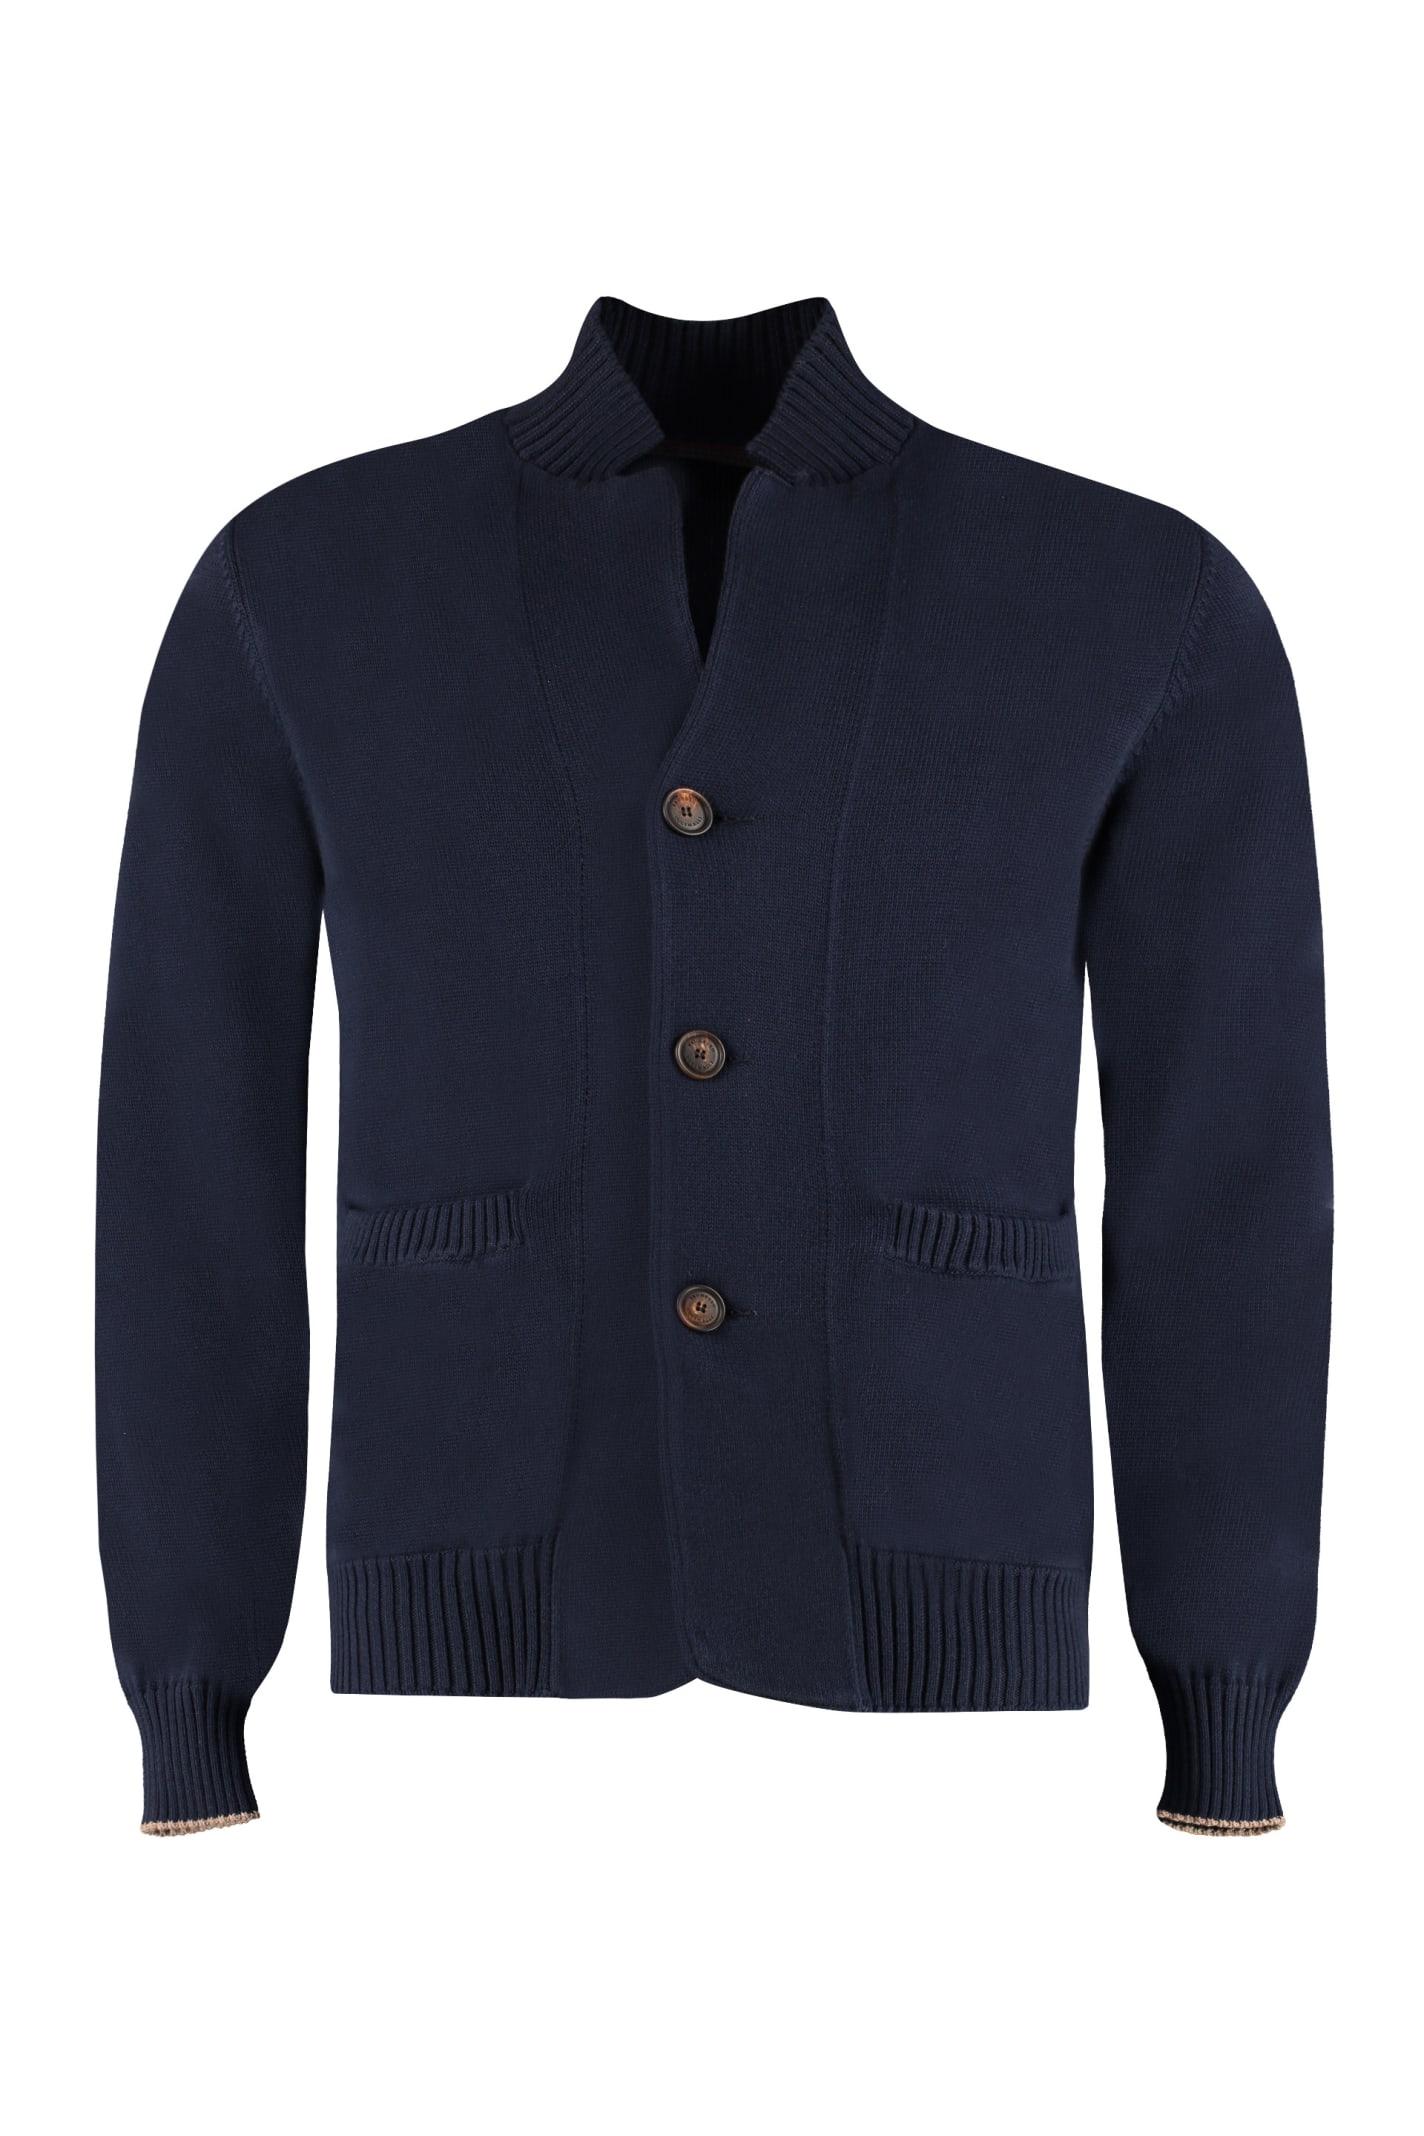 Brunello Cucinelli Buttoned Cotton Cardigan